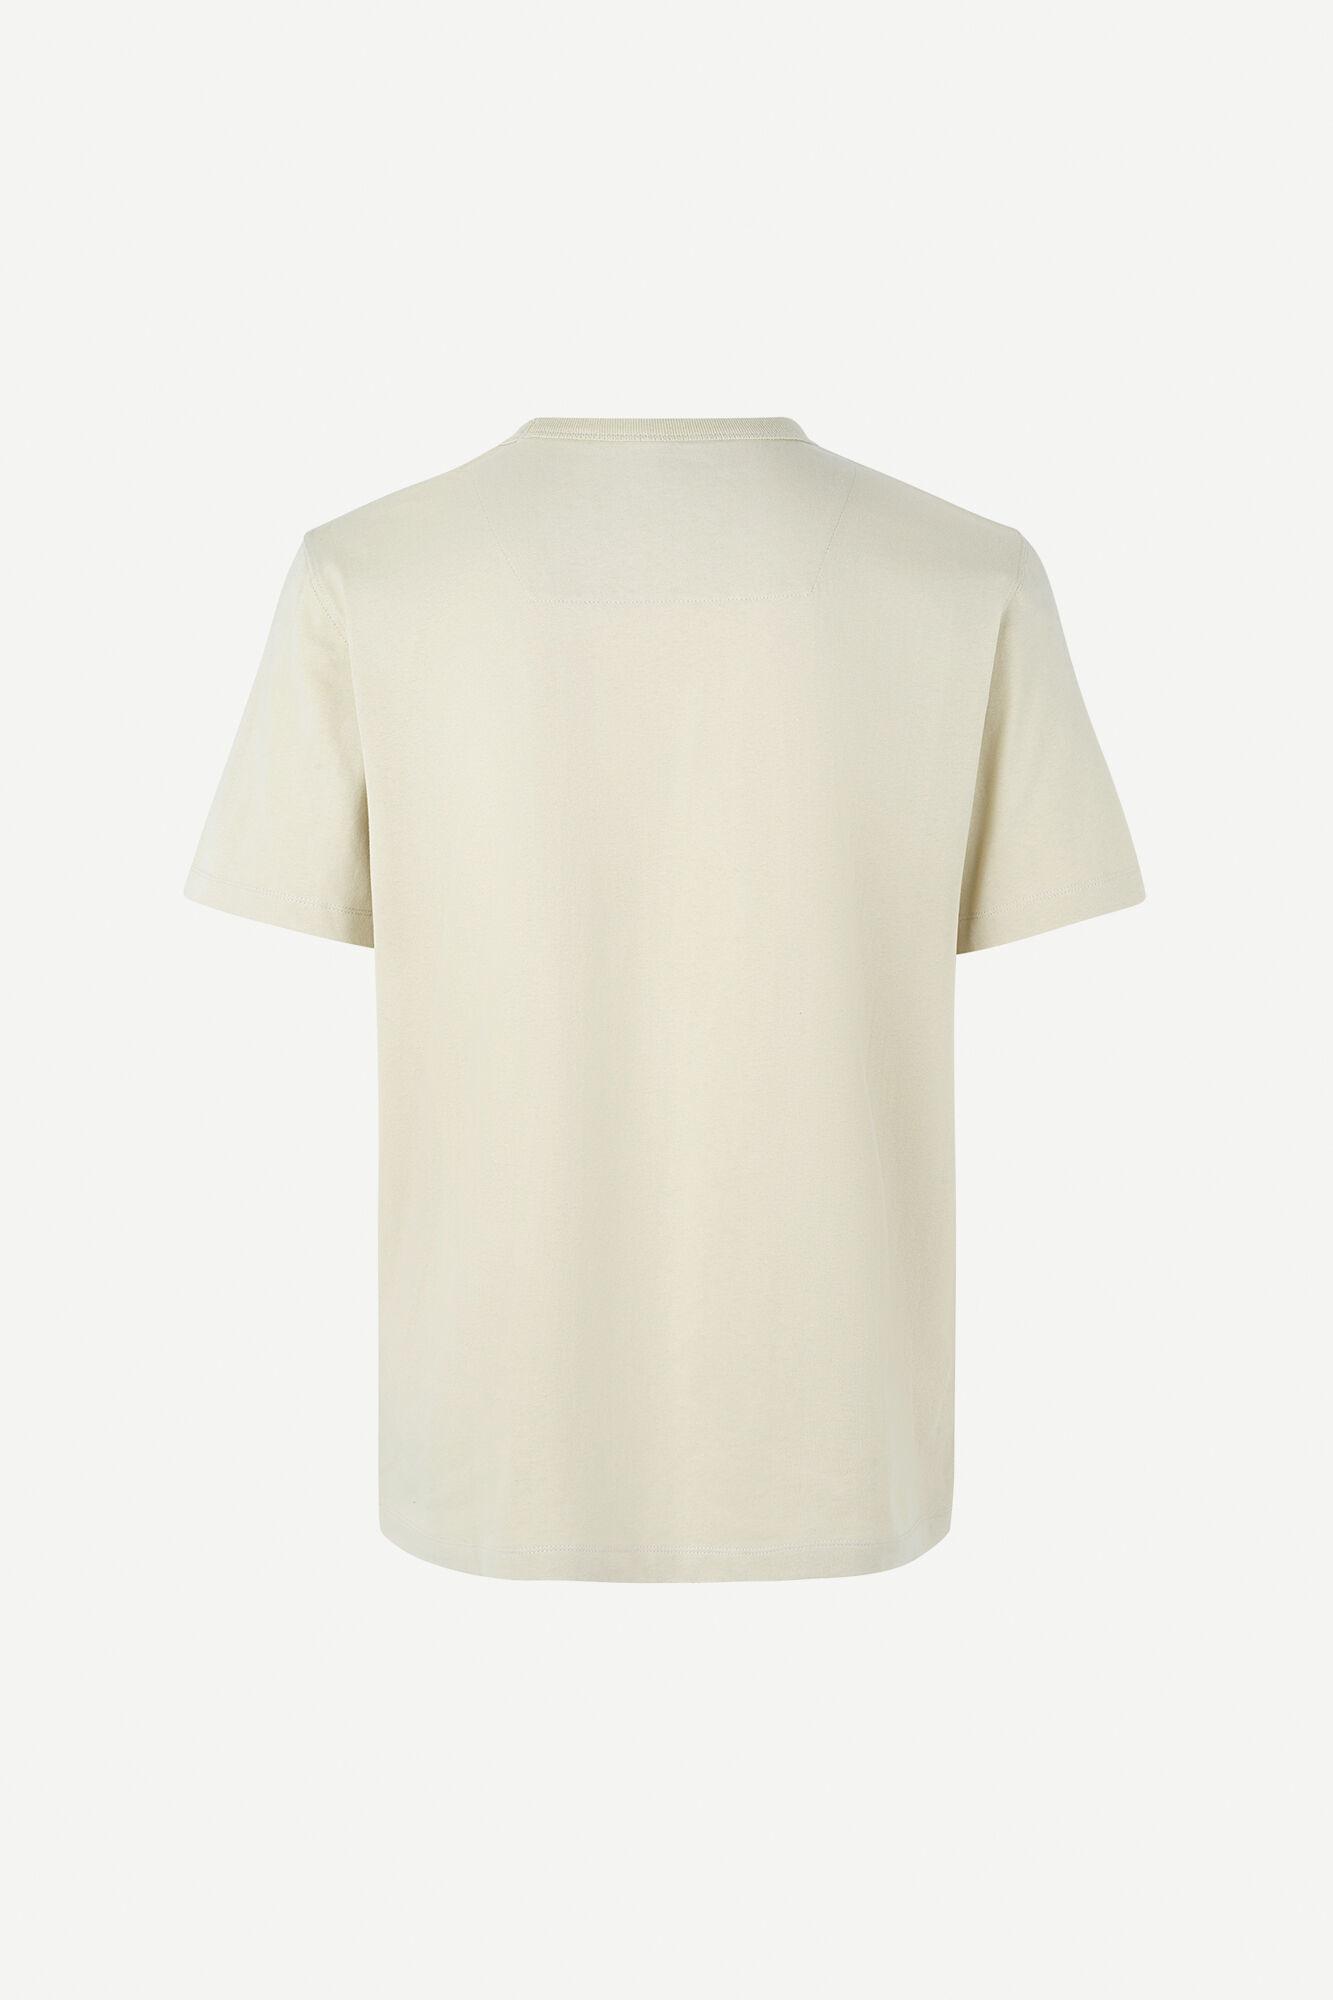 Hugo T-Shirt Crème Wit-2